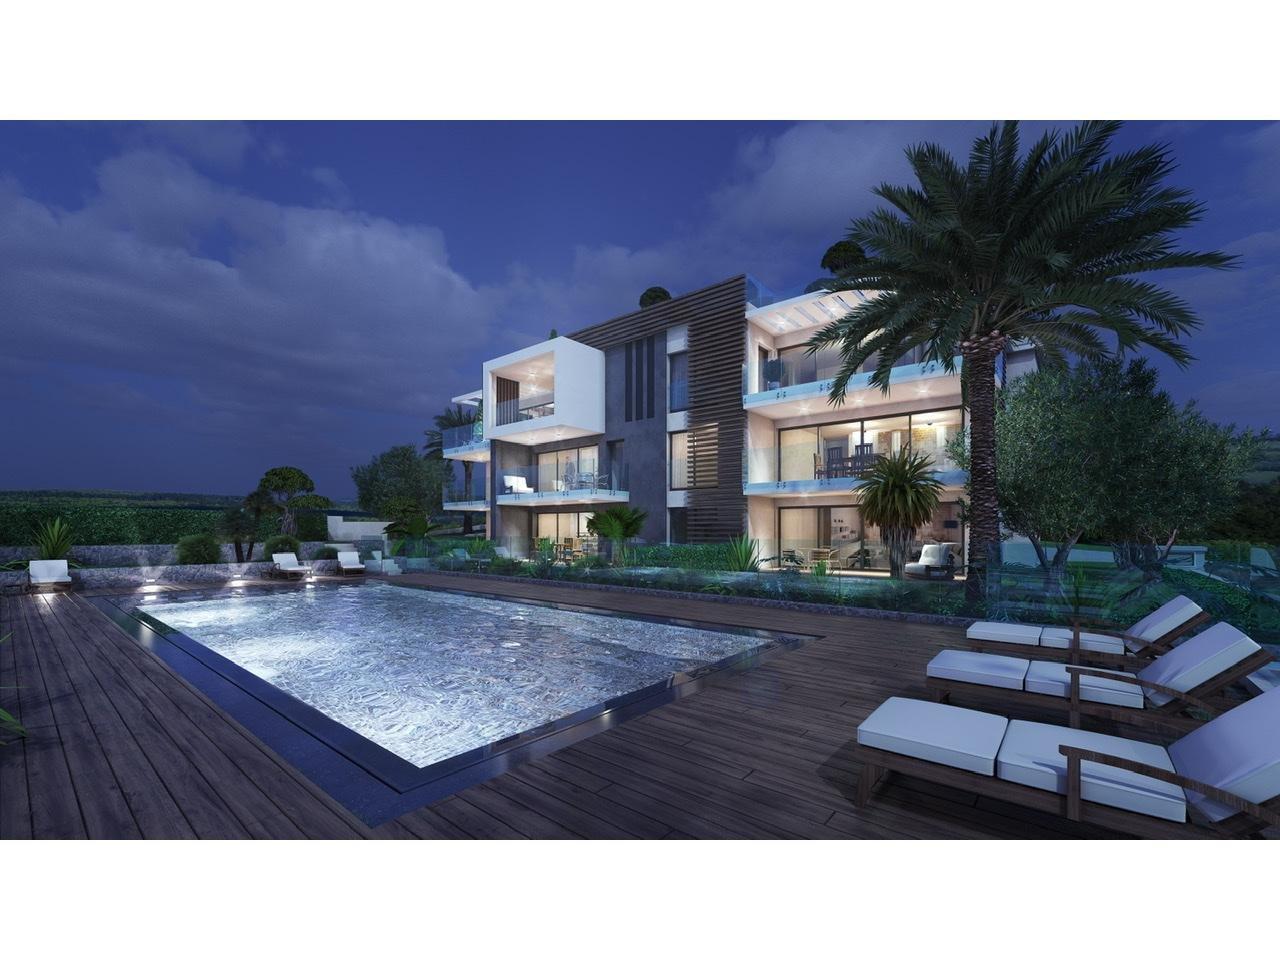 Appartement  4 Locali 109.27m2  In vendita  1150000 €